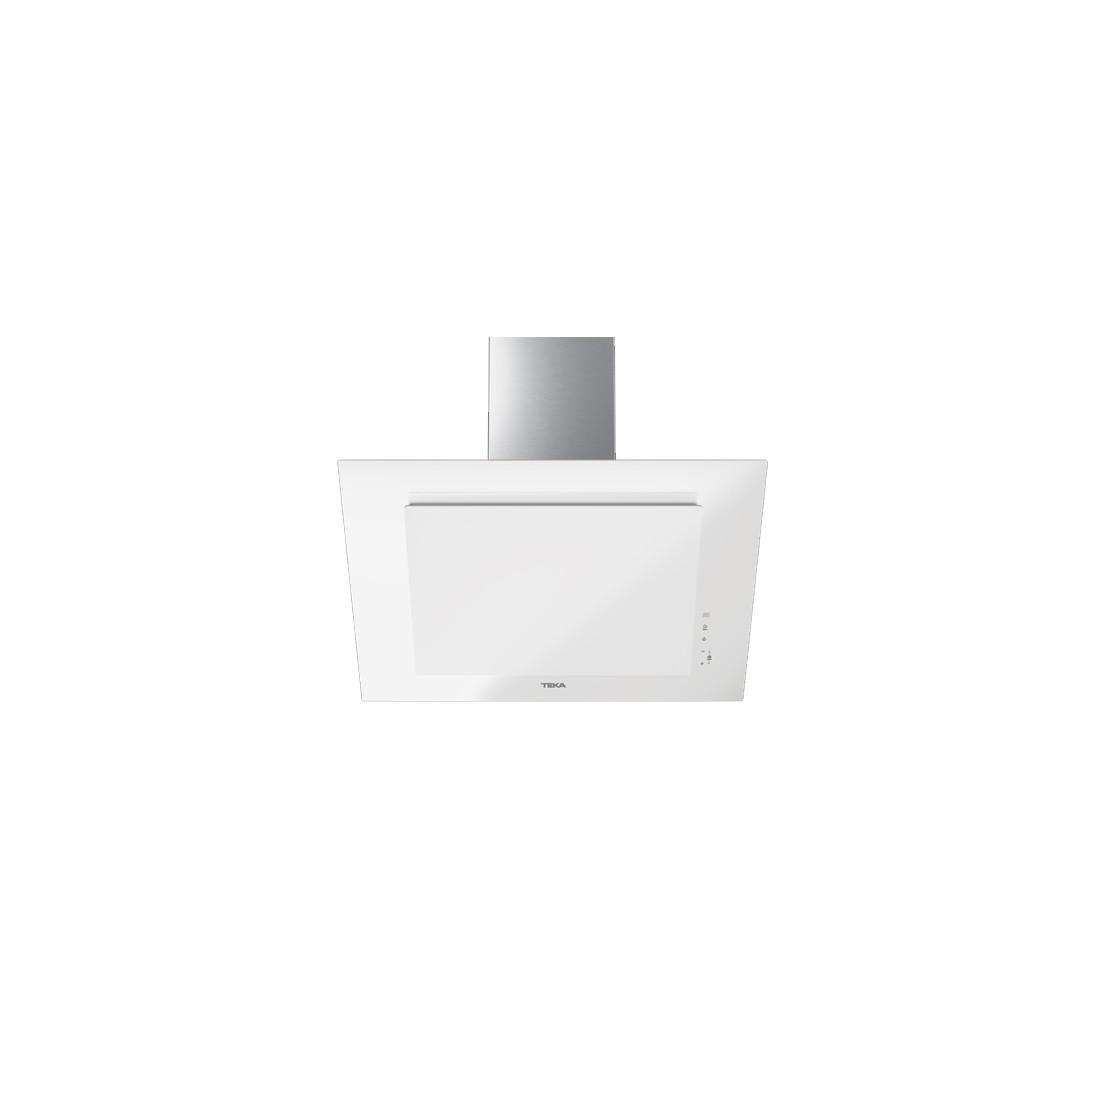 Campana Decorativa - Teka DVT 98660 TBS WH, 90 cm, Blanco